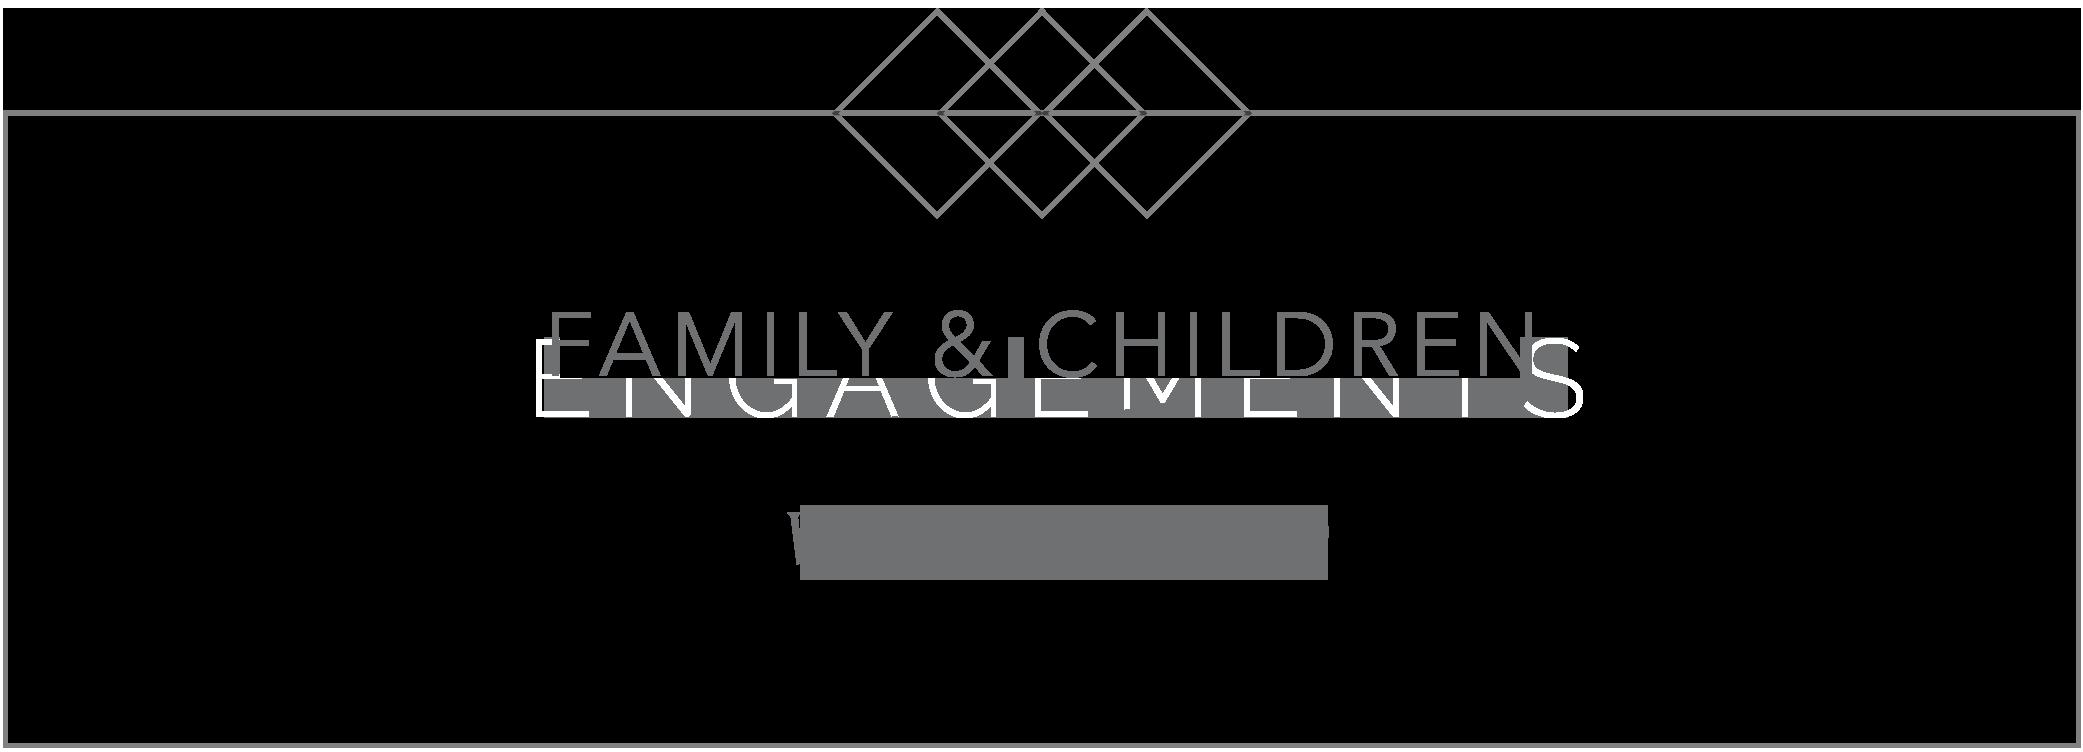 familyandchildren.png